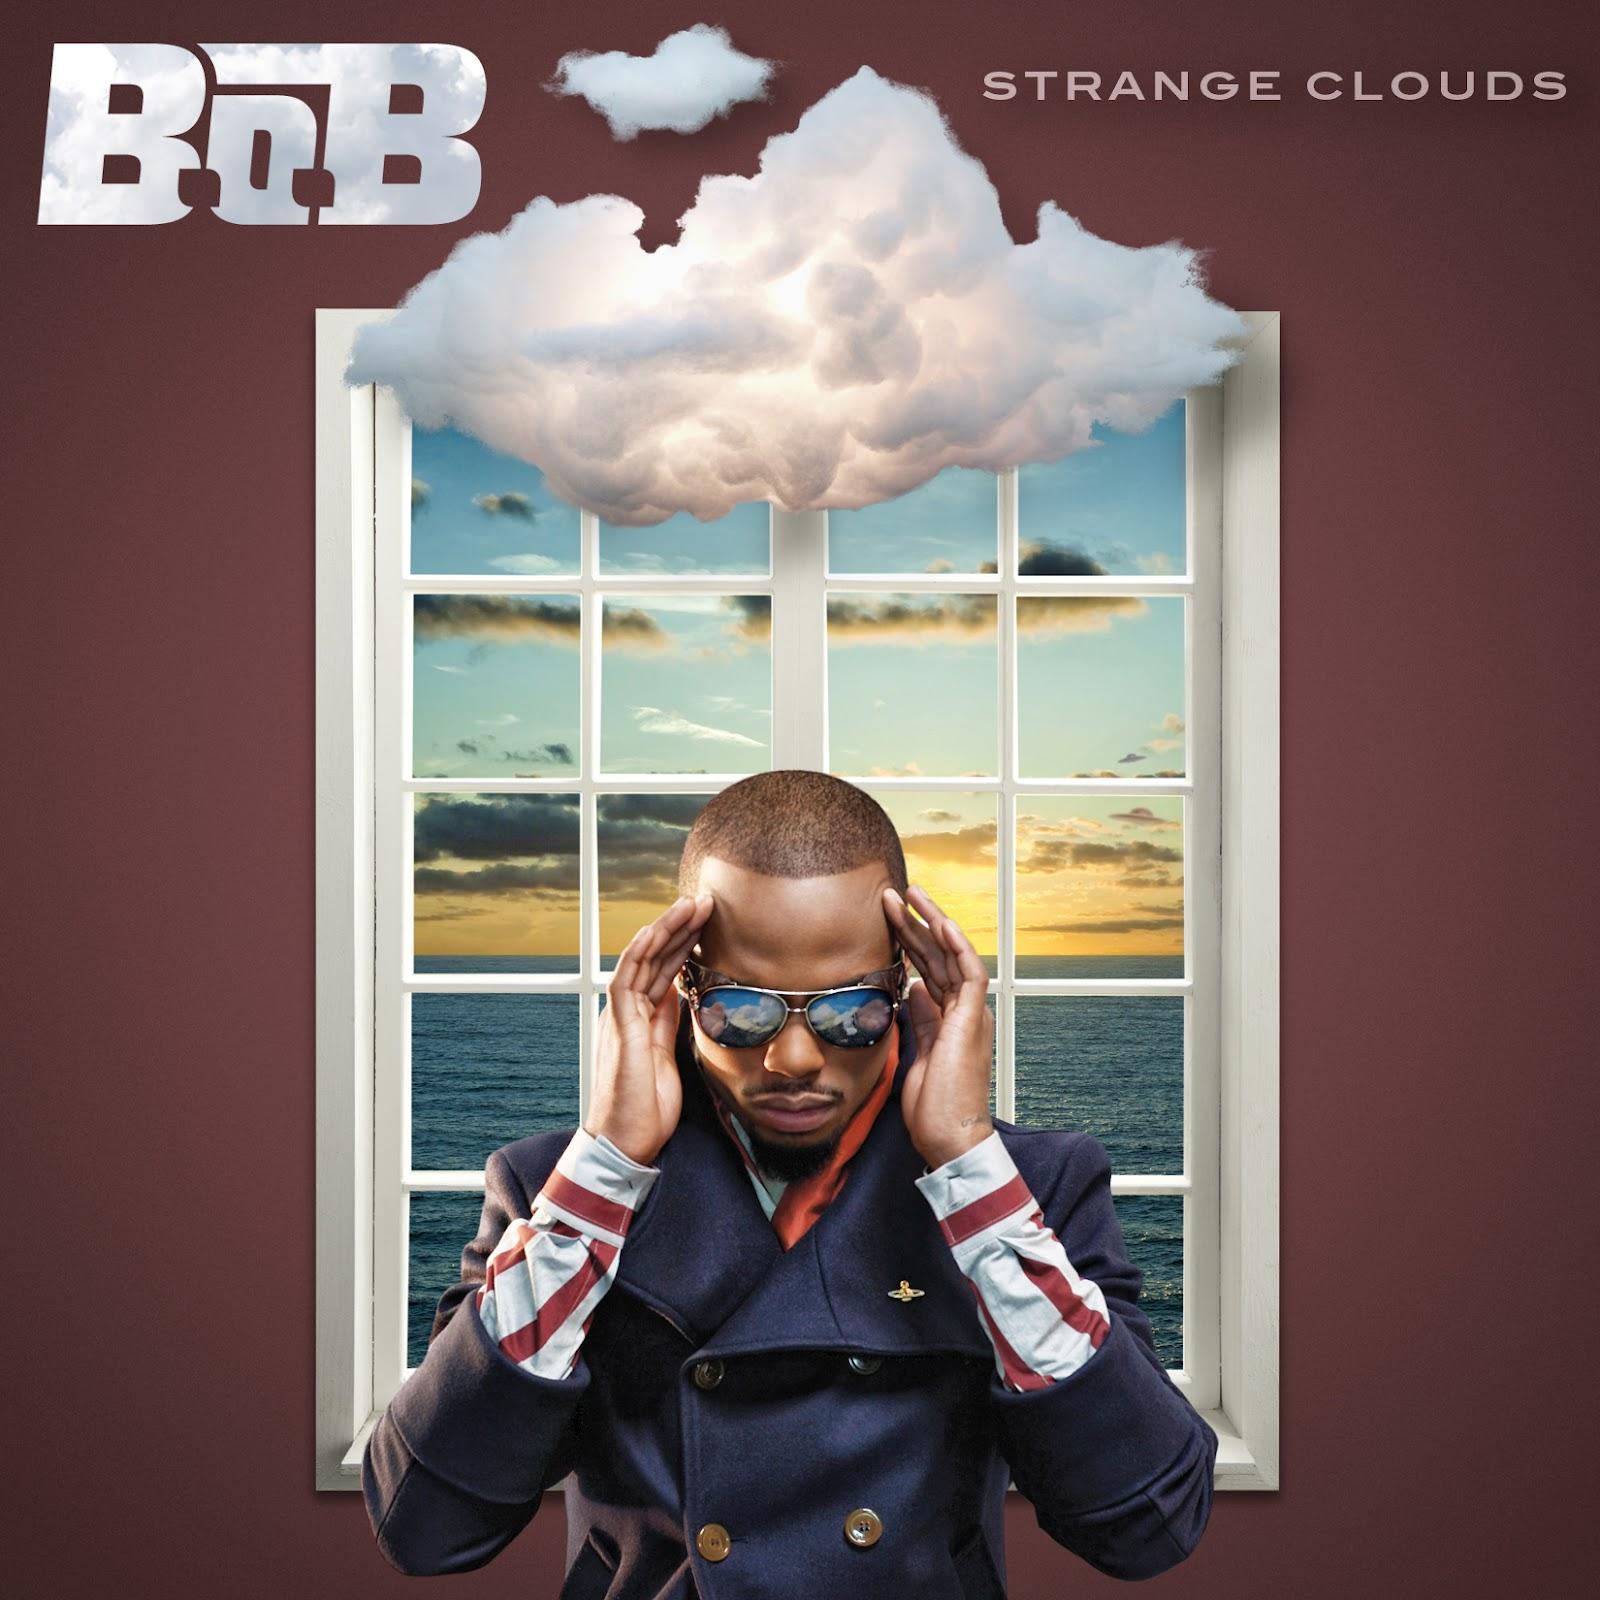 http://3.bp.blogspot.com/-BuqFAZdsrM8/UCJvM5maISI/AAAAAAAAF8I/Em5OUVtG9MA/s1600/b.o.b-strange_clouds-2012-cover.jpg